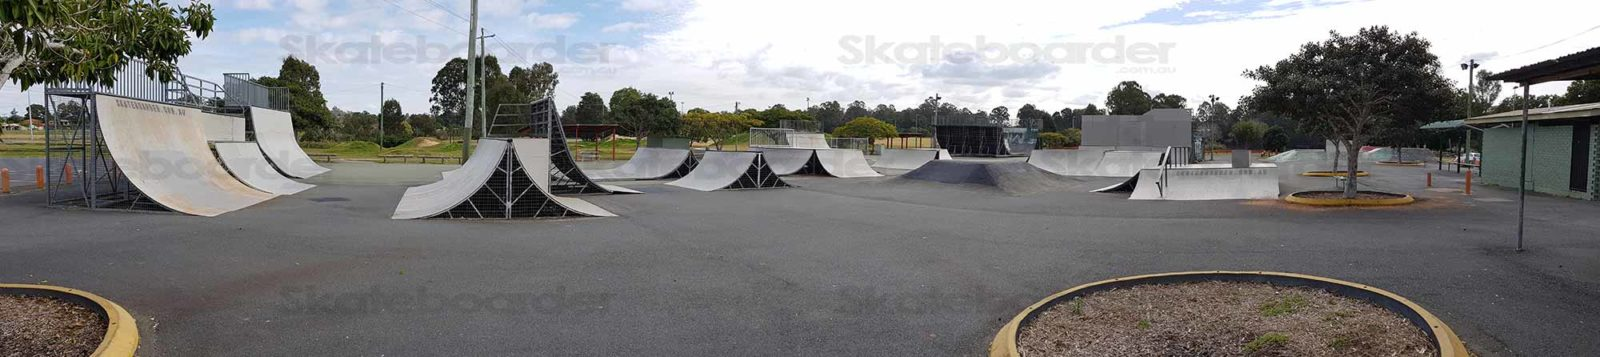 Beenleigh Skatepark original form